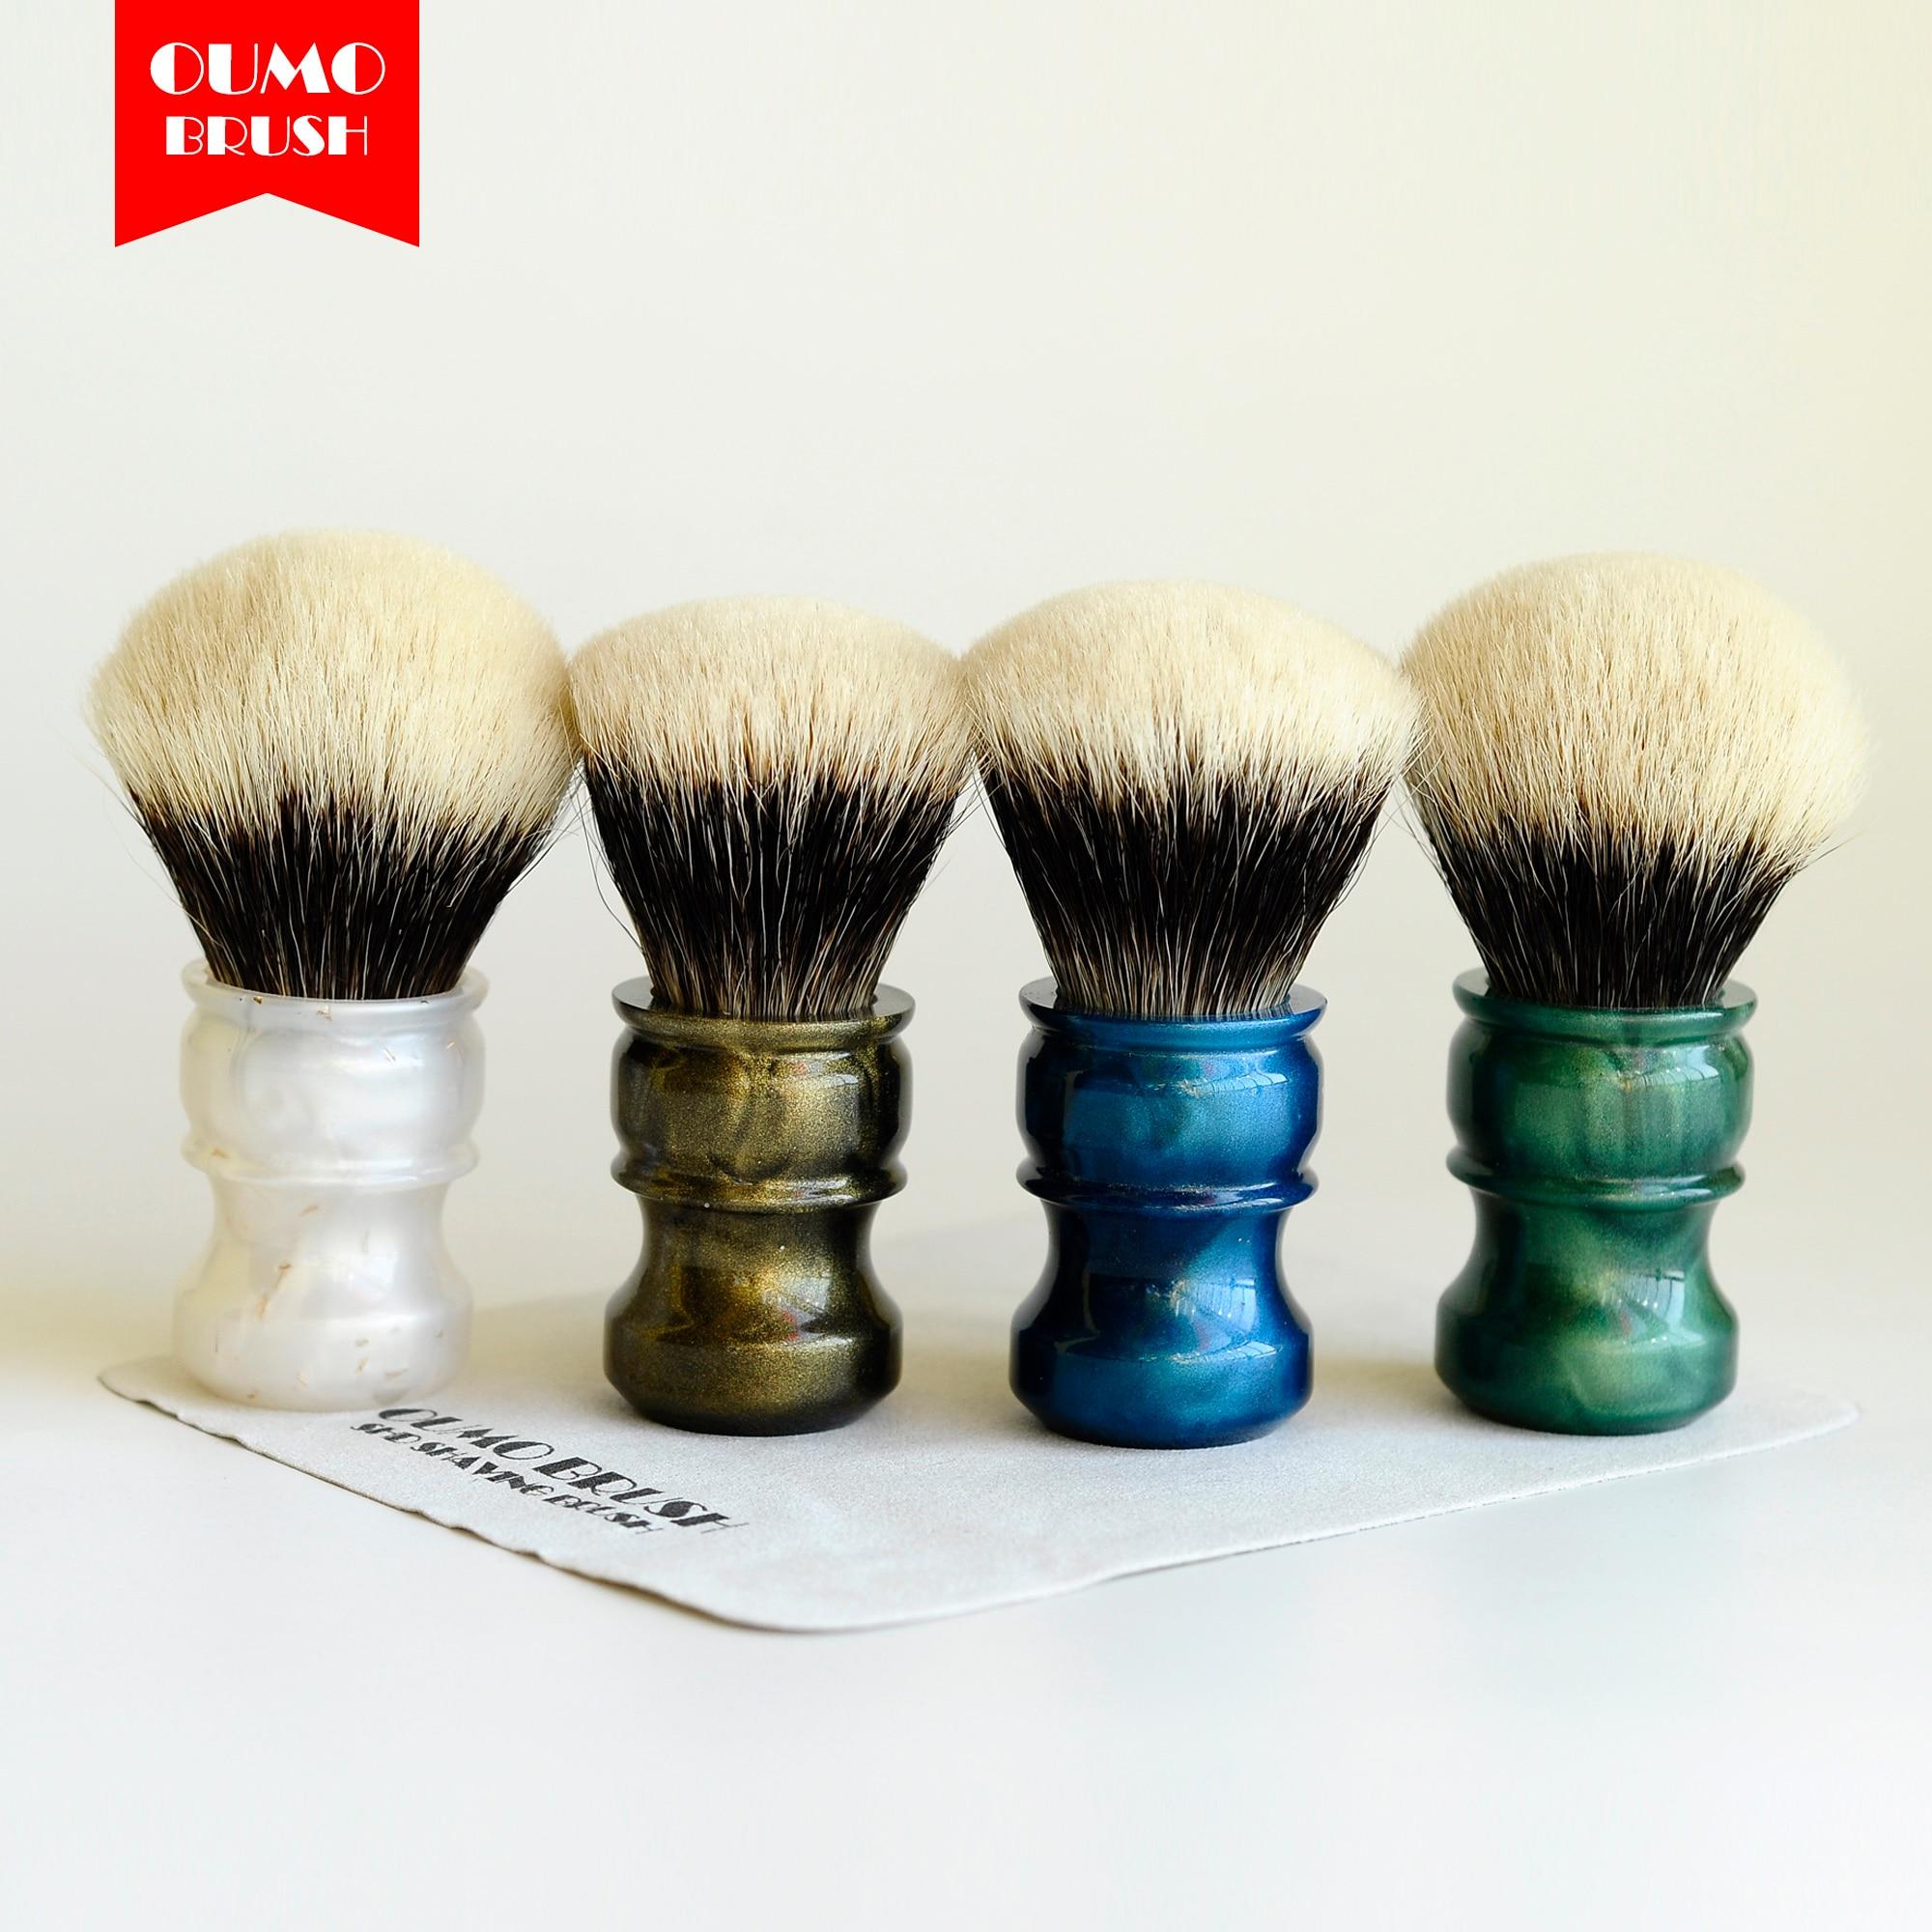 OUMO BRUSH-Fans Exclusive Limit Bulb Handmaster Finest Badger Hair Knots Shaving Brush